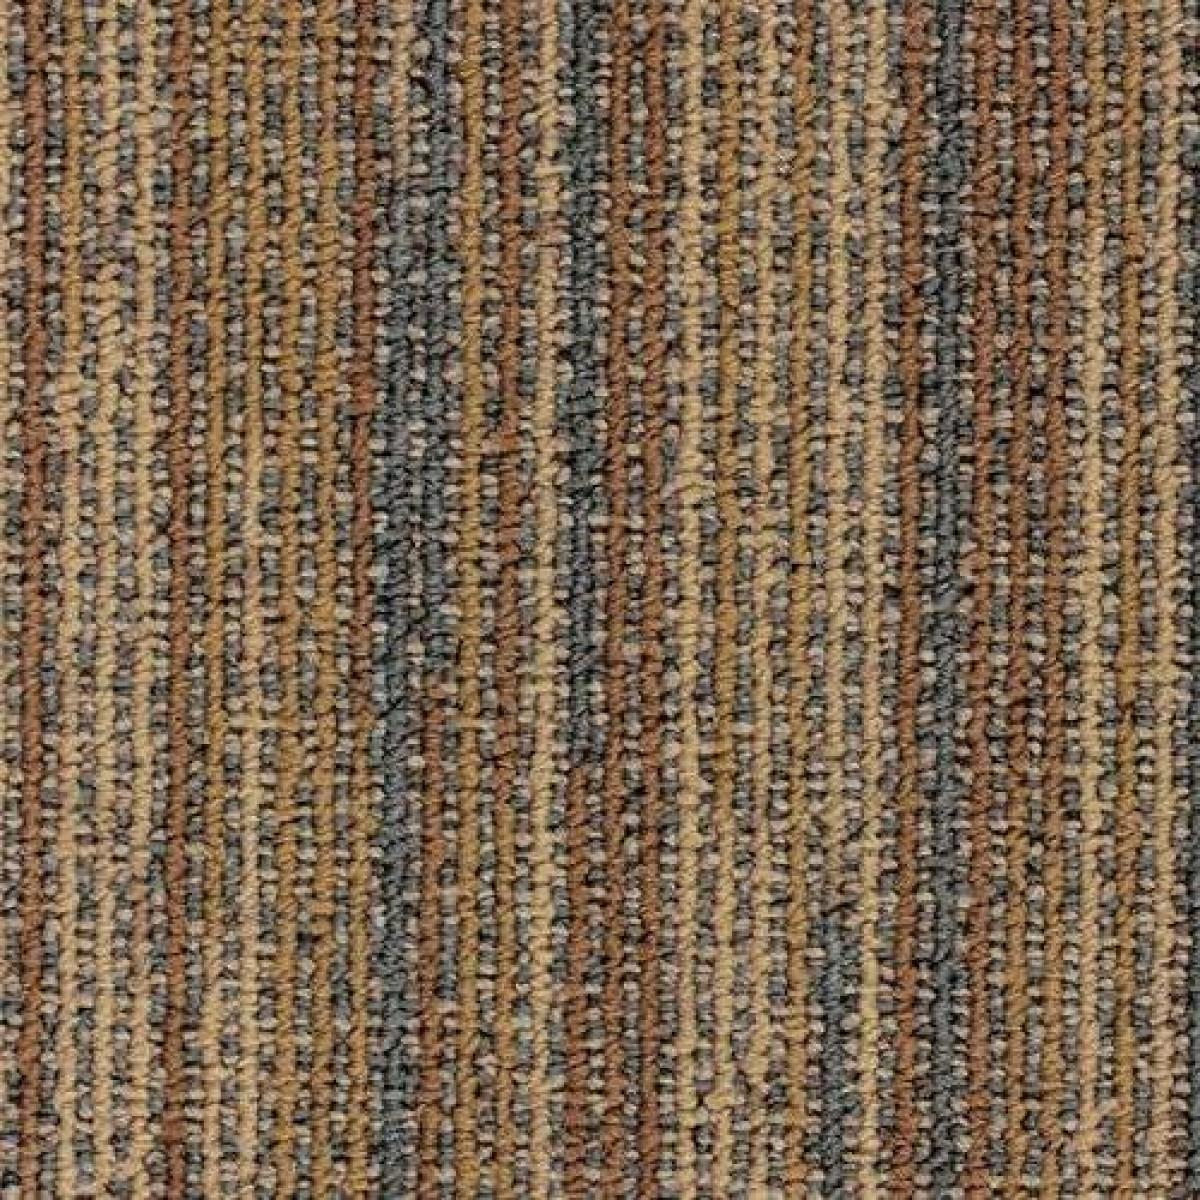 Heavy contract carpet tiles aiken flooring contracts ltd for Contract flooring